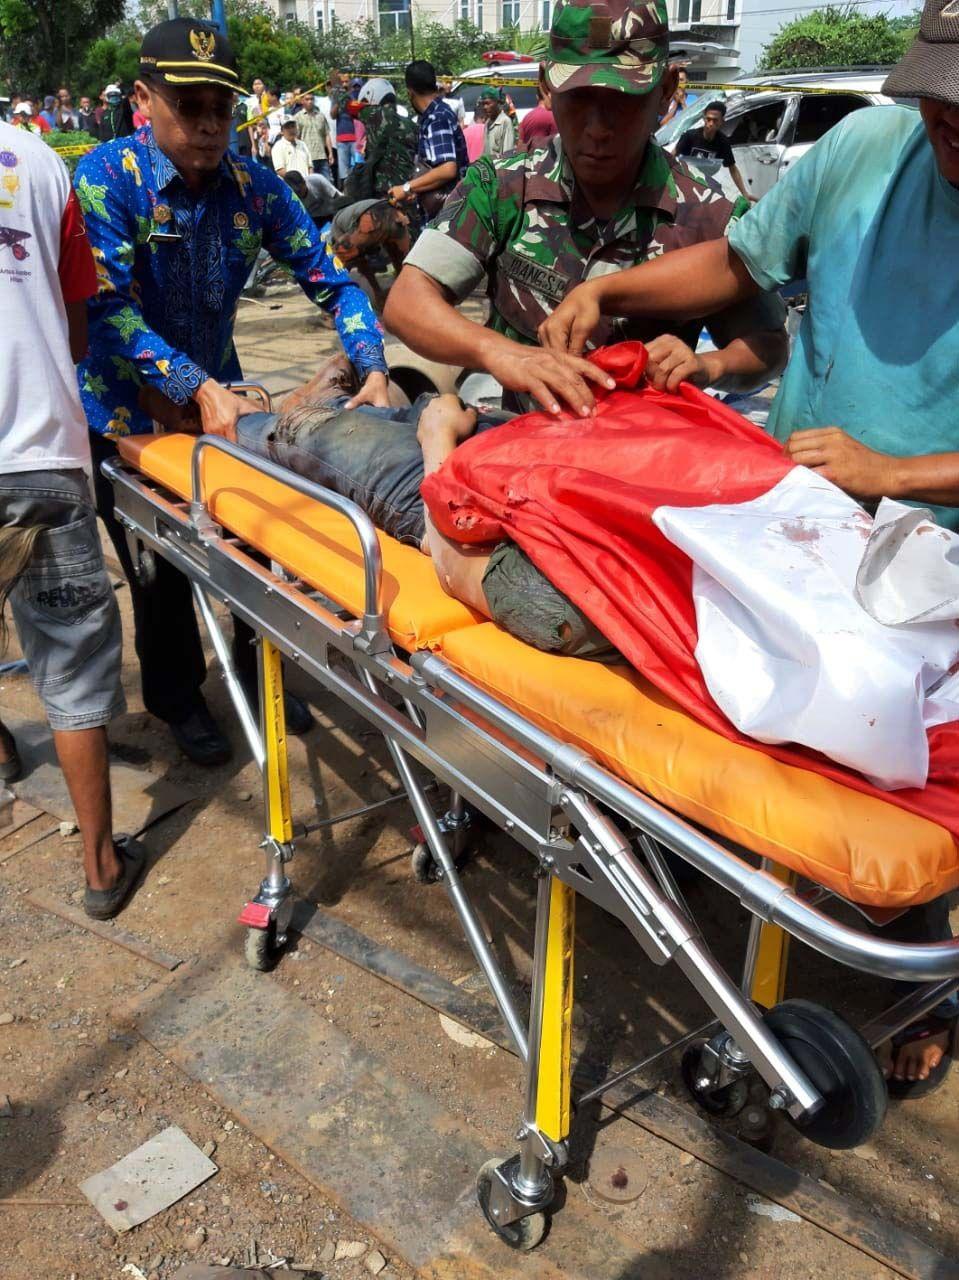 Ledakan terjadi di bengkel las di Binjai. Ledakan itu menewaskan empat orang dan menyebabkan sembilan orang lainnya luka berat.